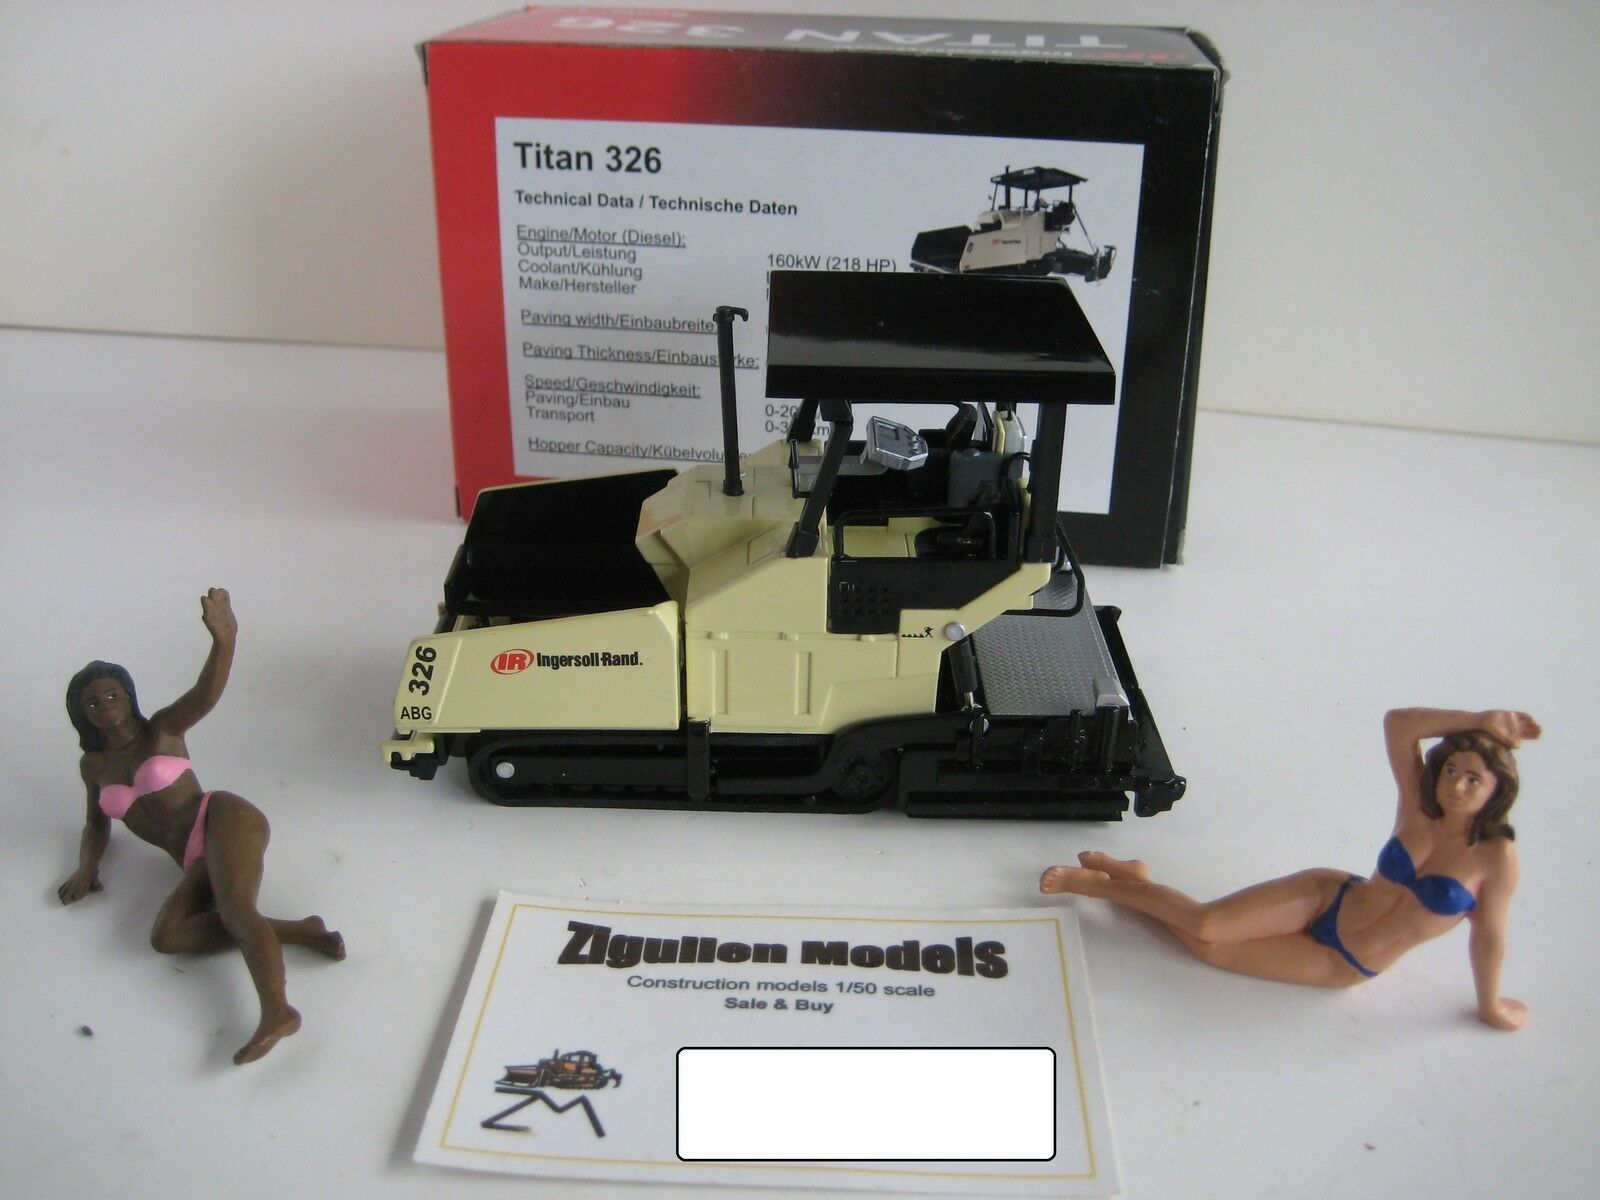 INGERSOLL RAND ABG TITAN 326 FERTIGER LIMITED 1 50 OVP CONRAD    Große Ausverkauf